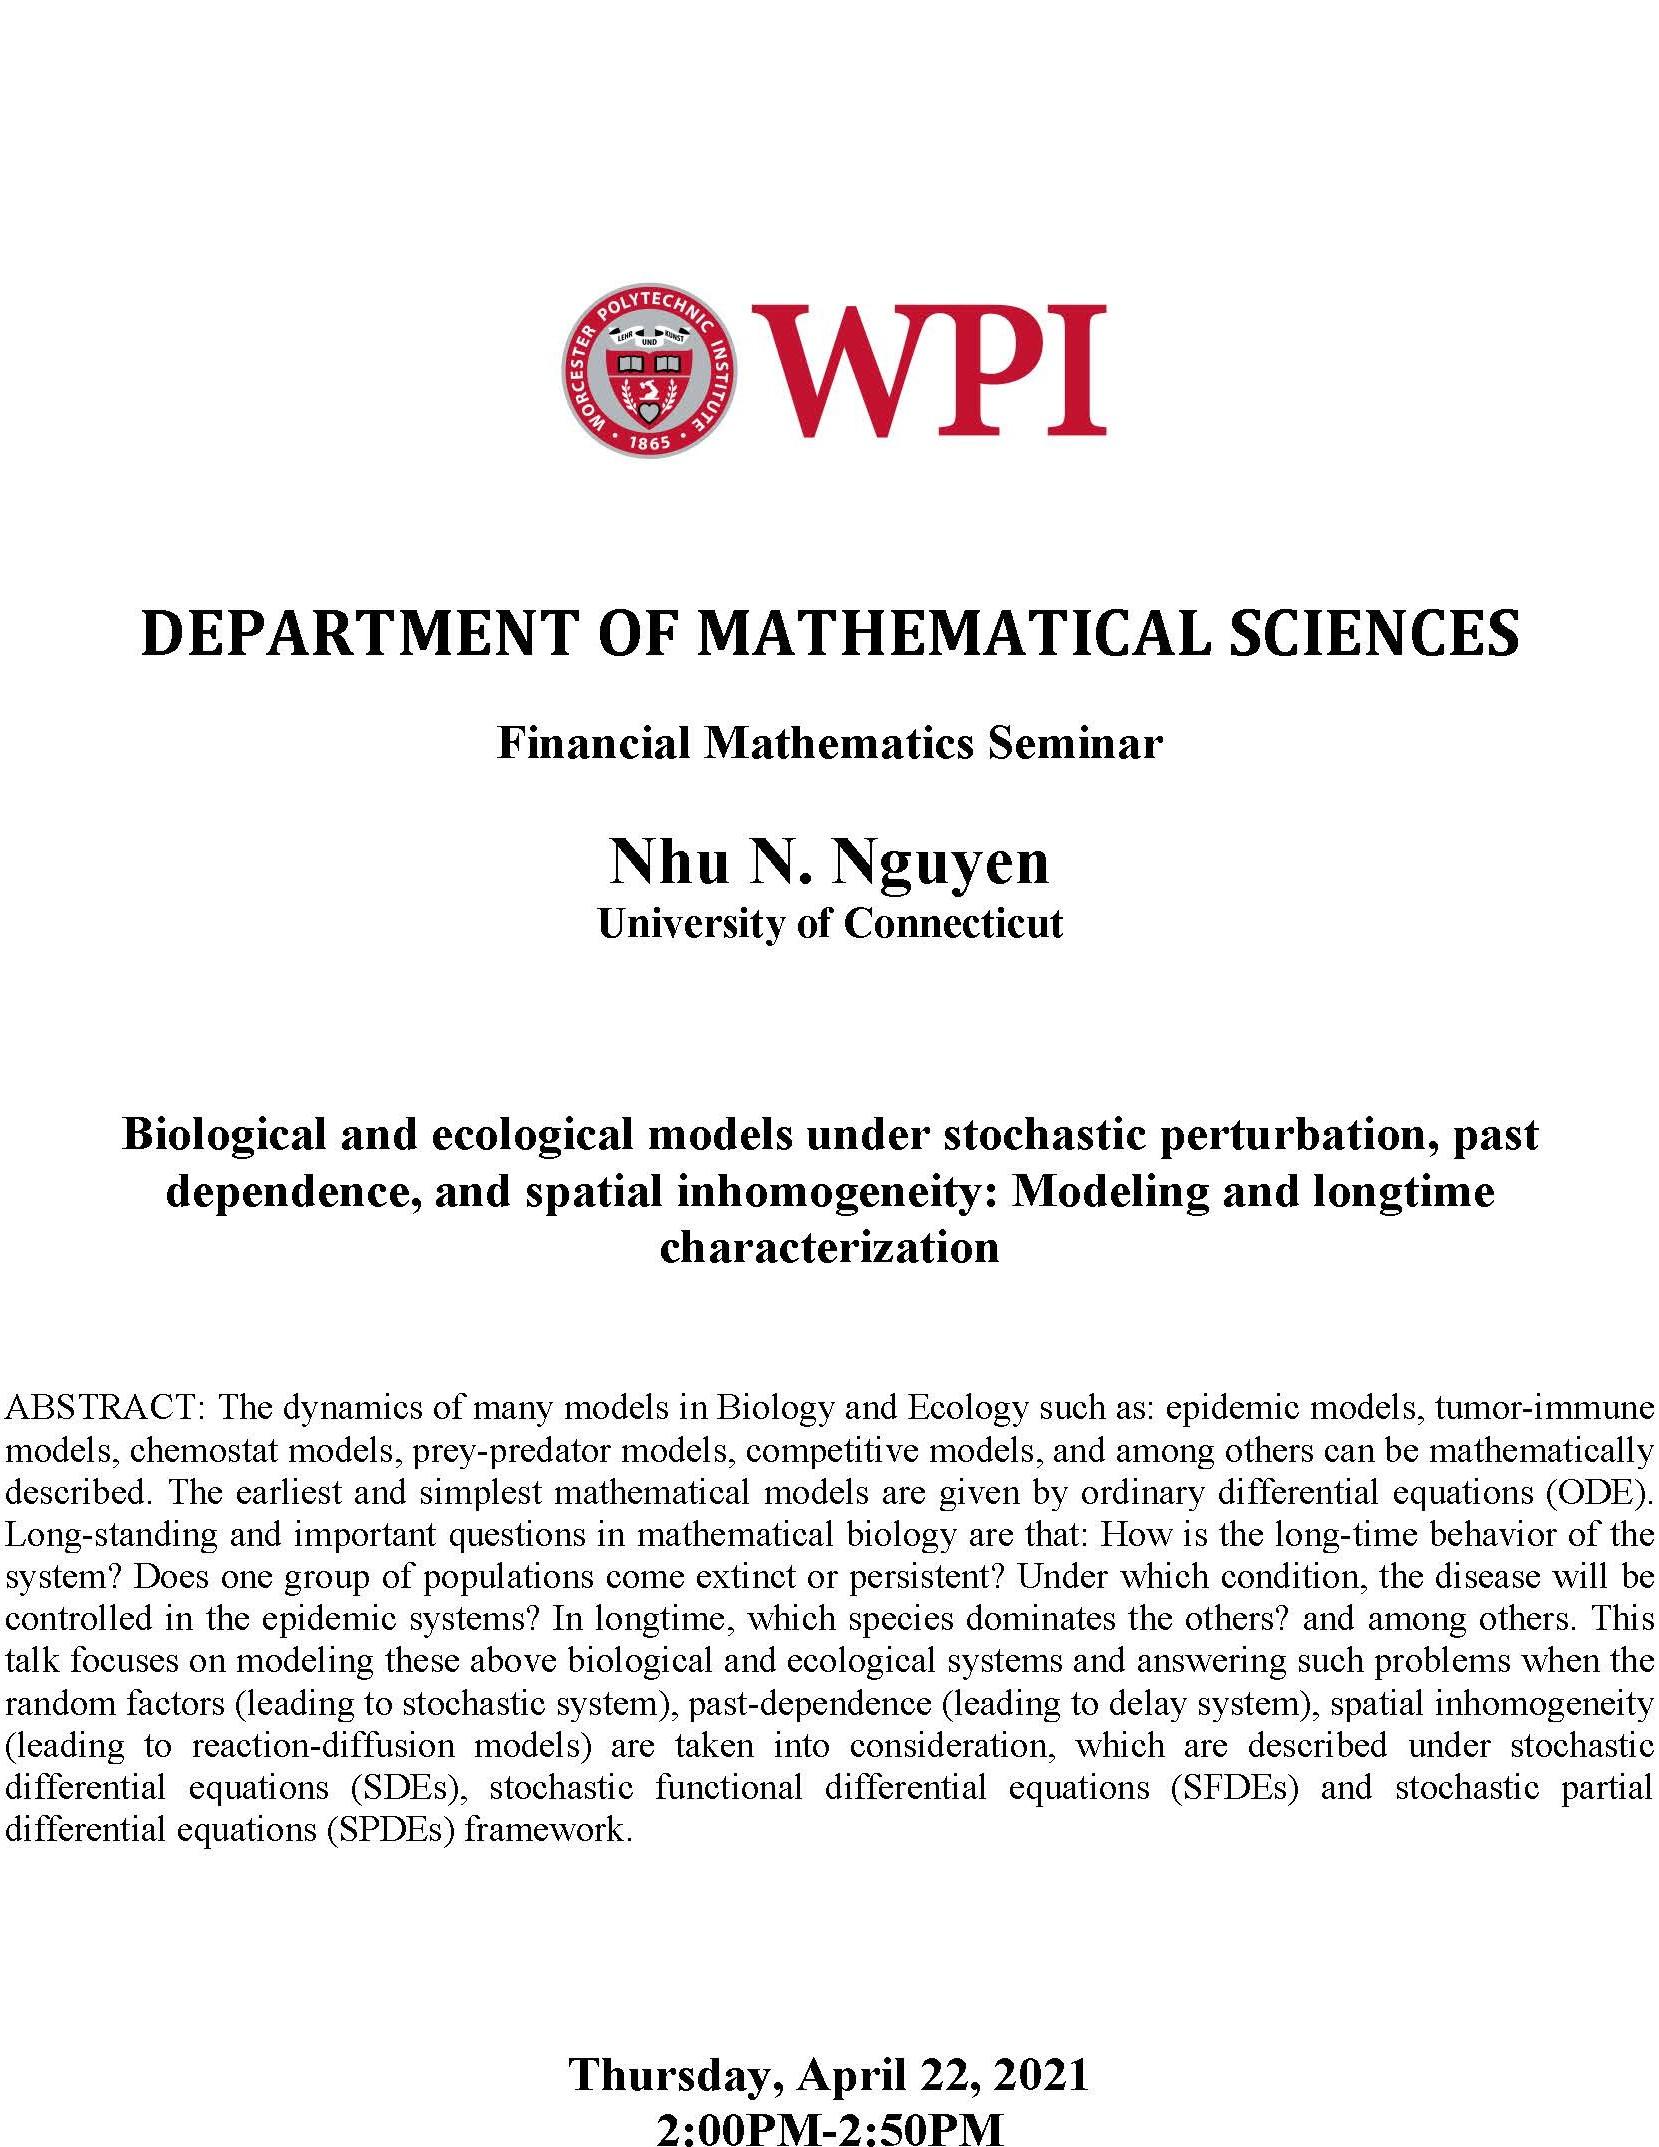 Nhu N. Nguyen Financial Math Seminar